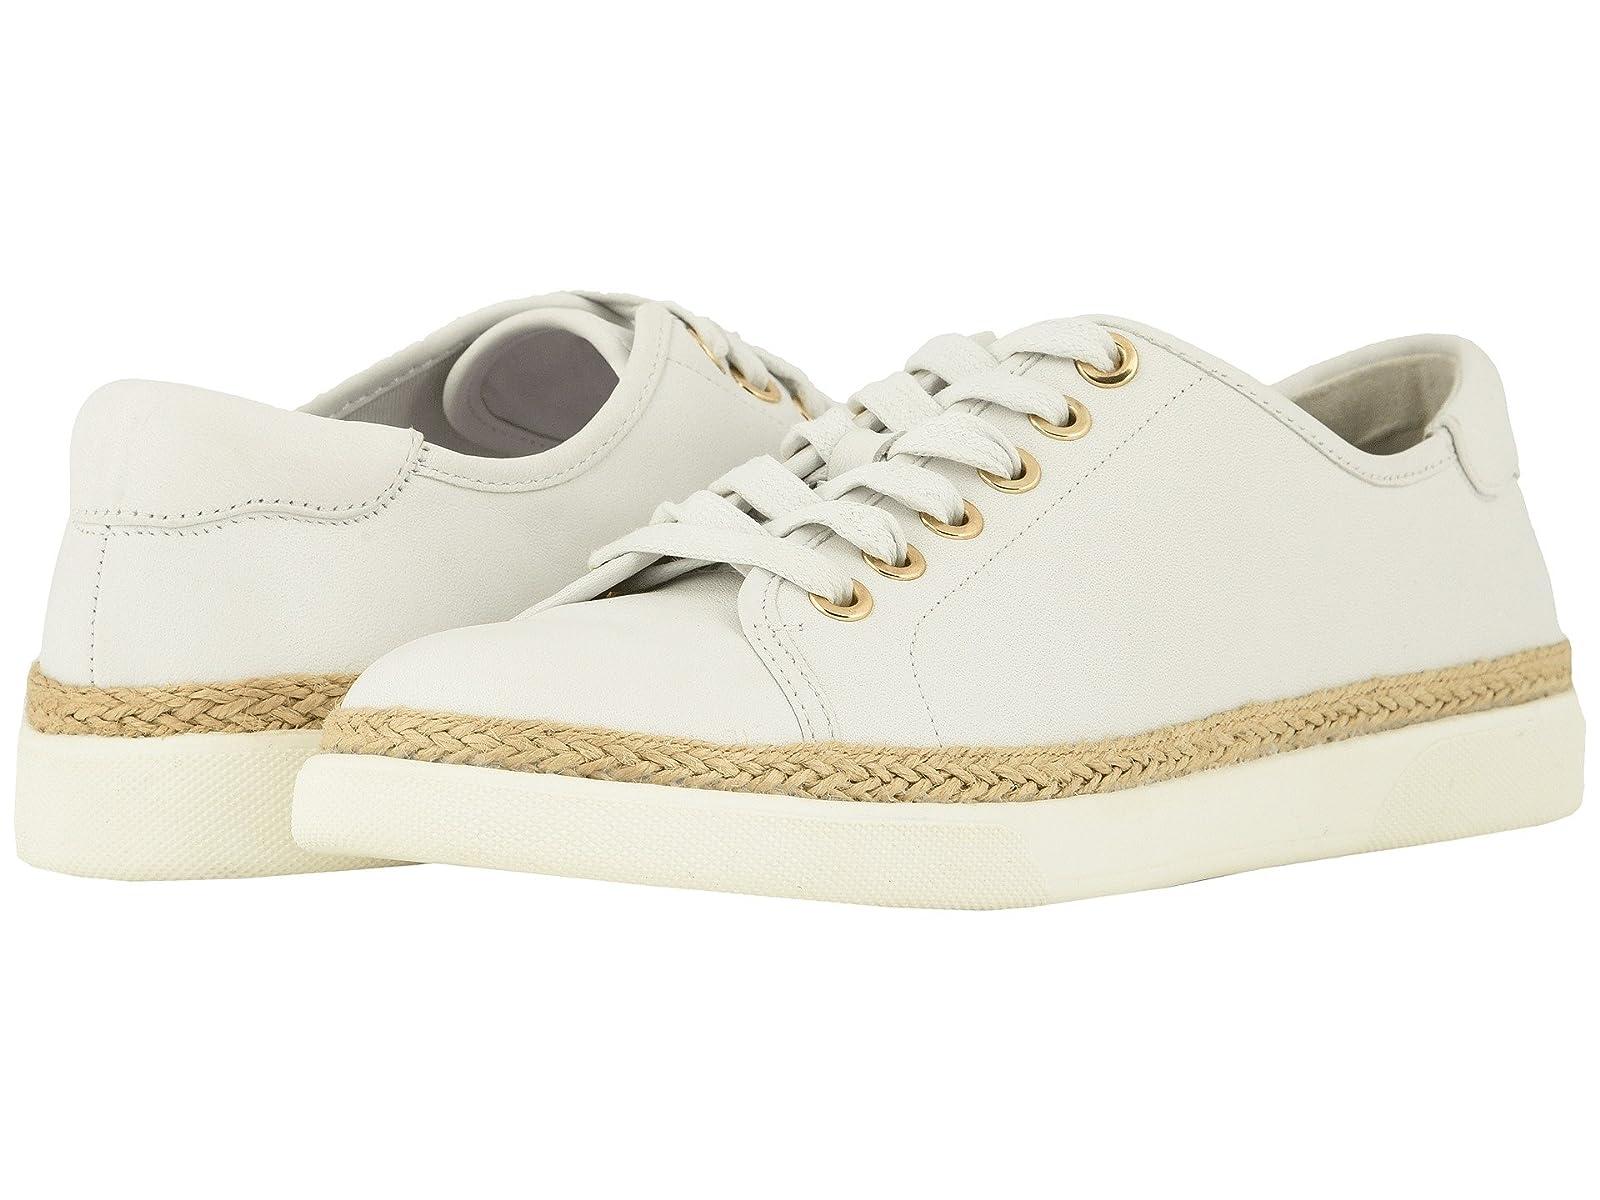 VIONIC LeahAtmospheric grades have affordable shoes